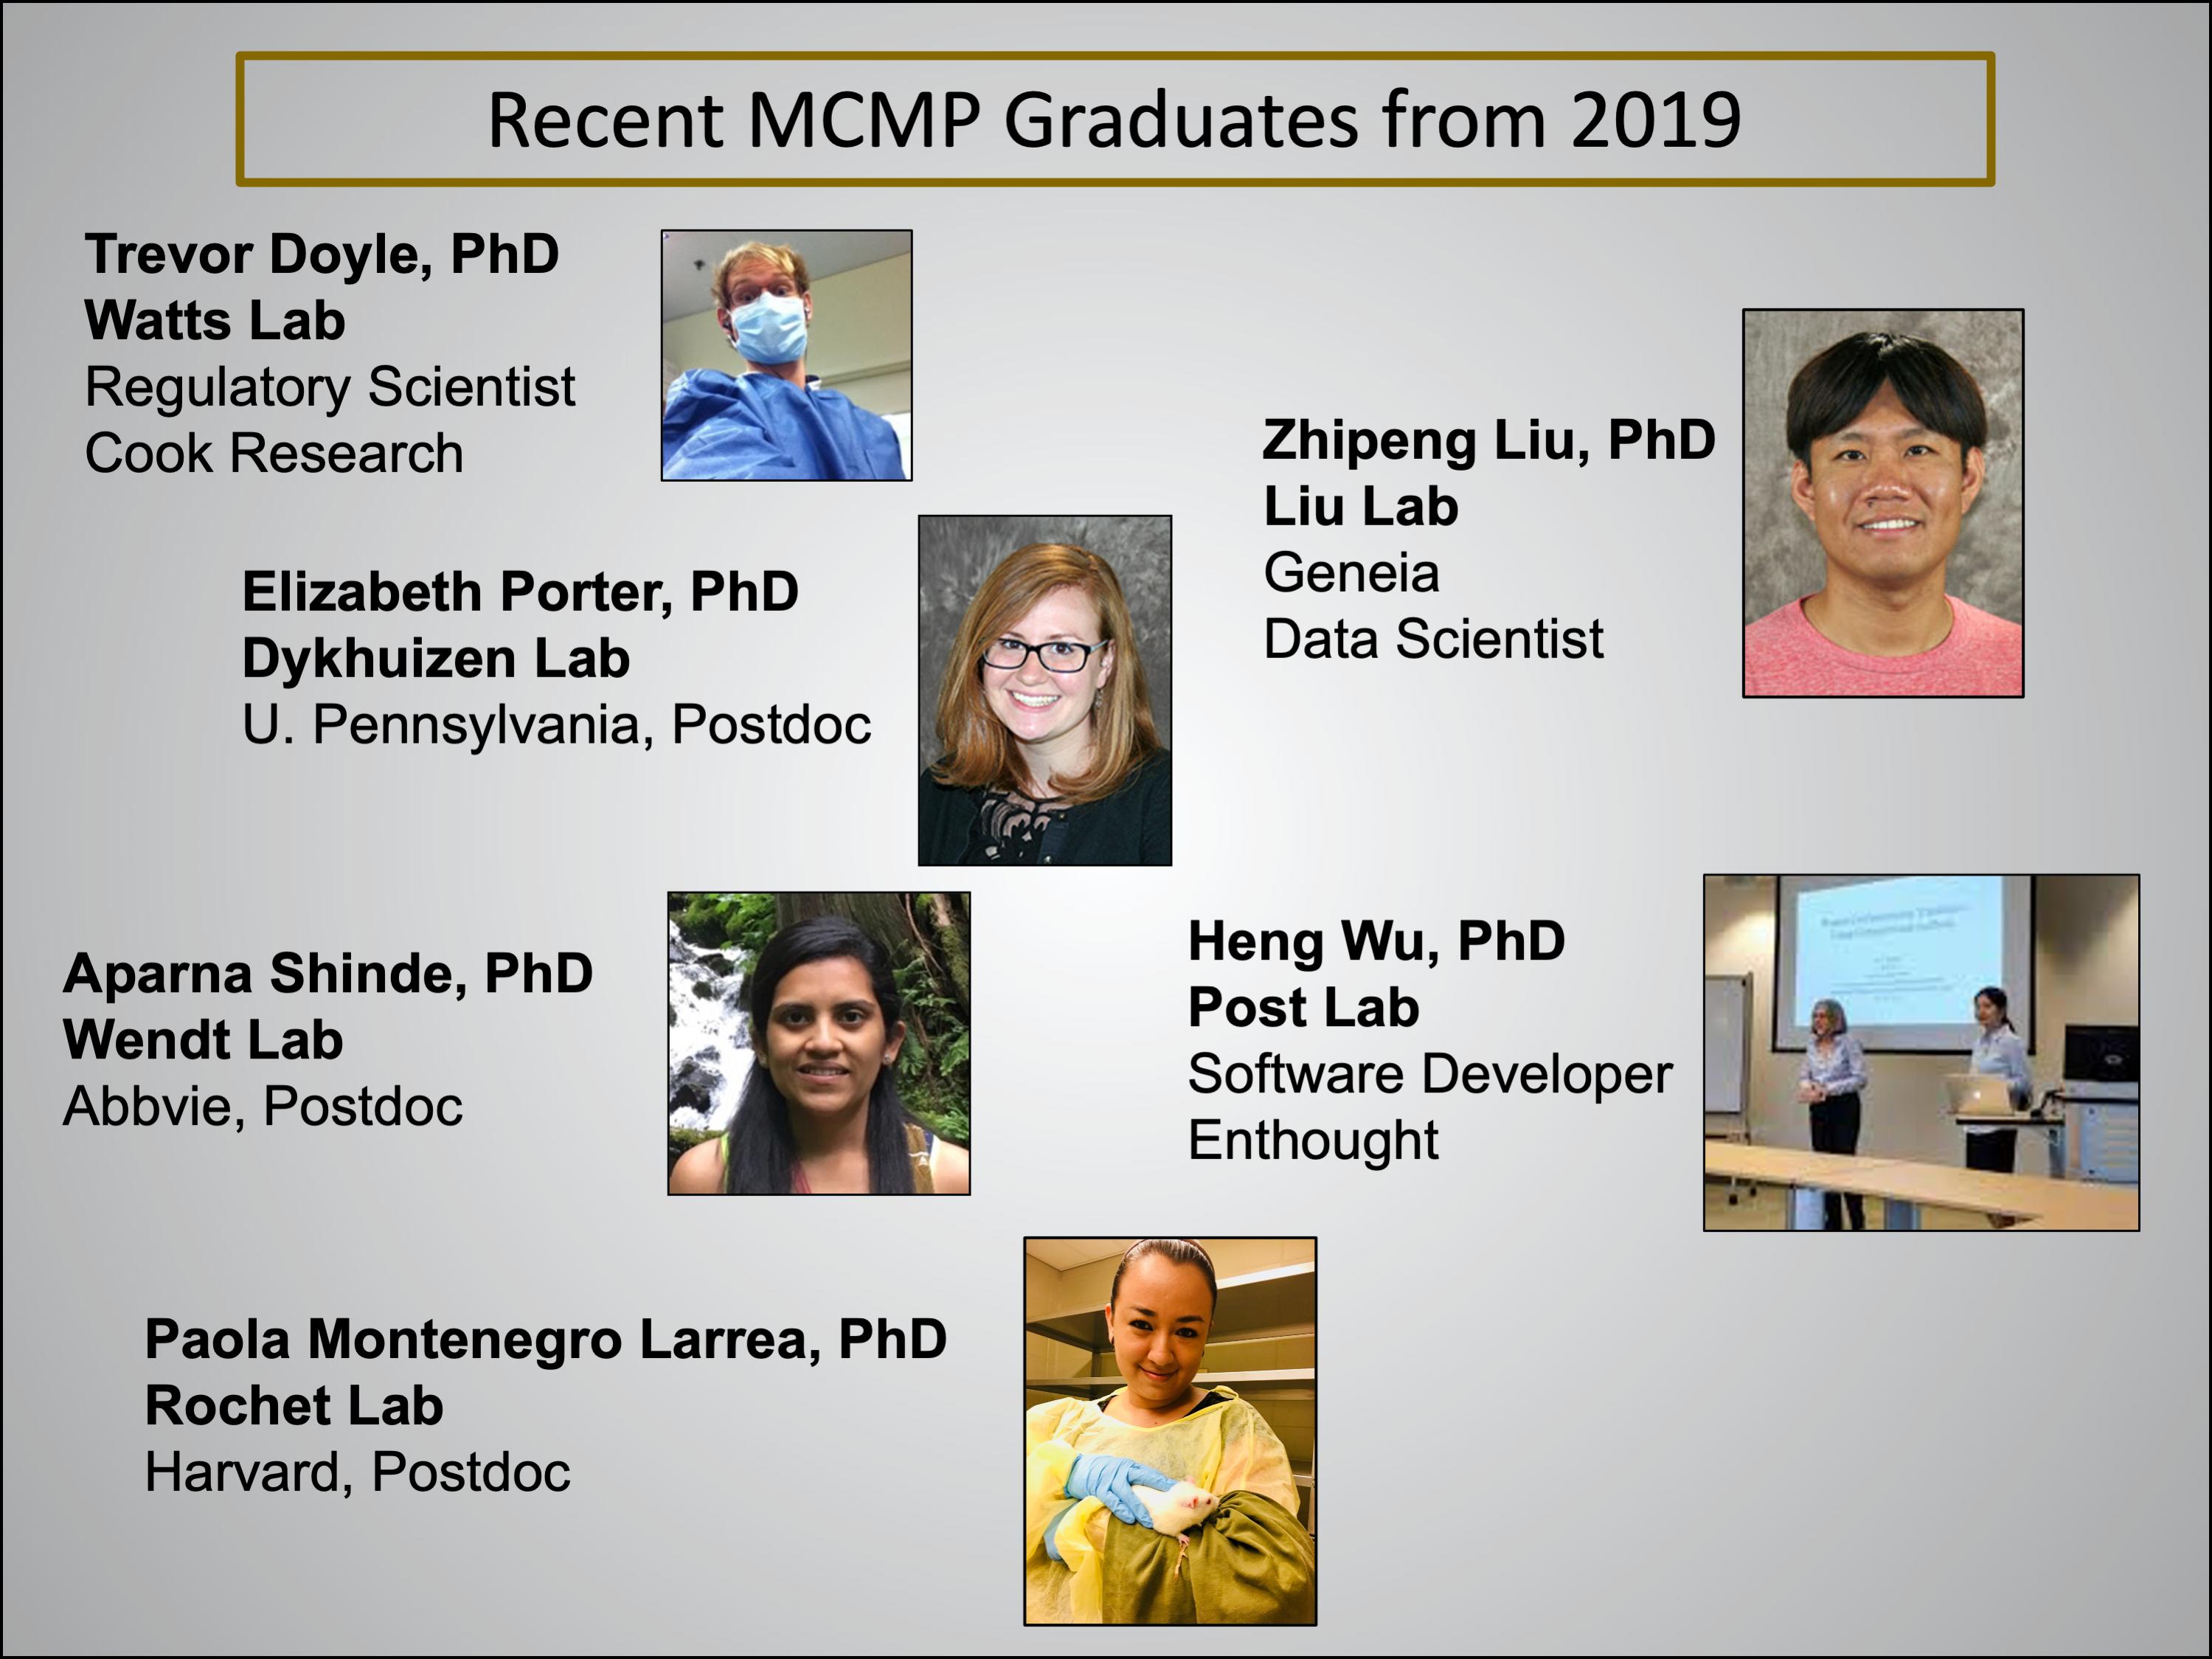 Recent graduates from the MCMP program